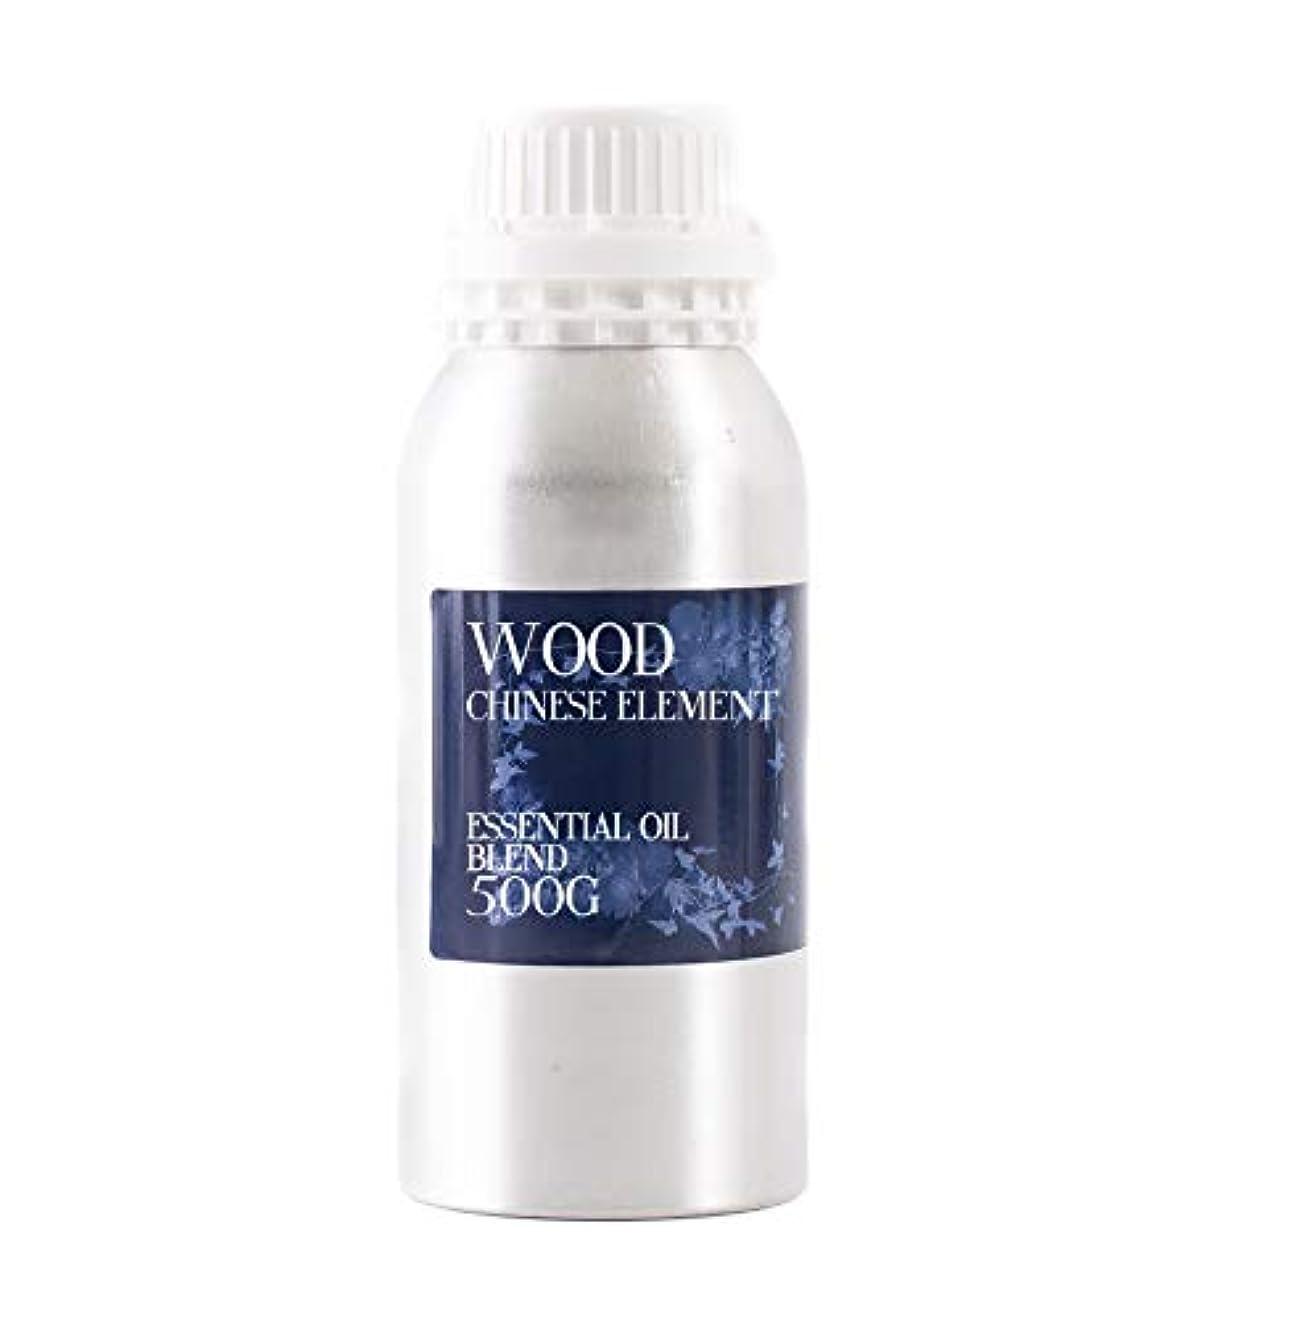 Mystix London | Chinese Wood Element Essential Oil Blend - 500g